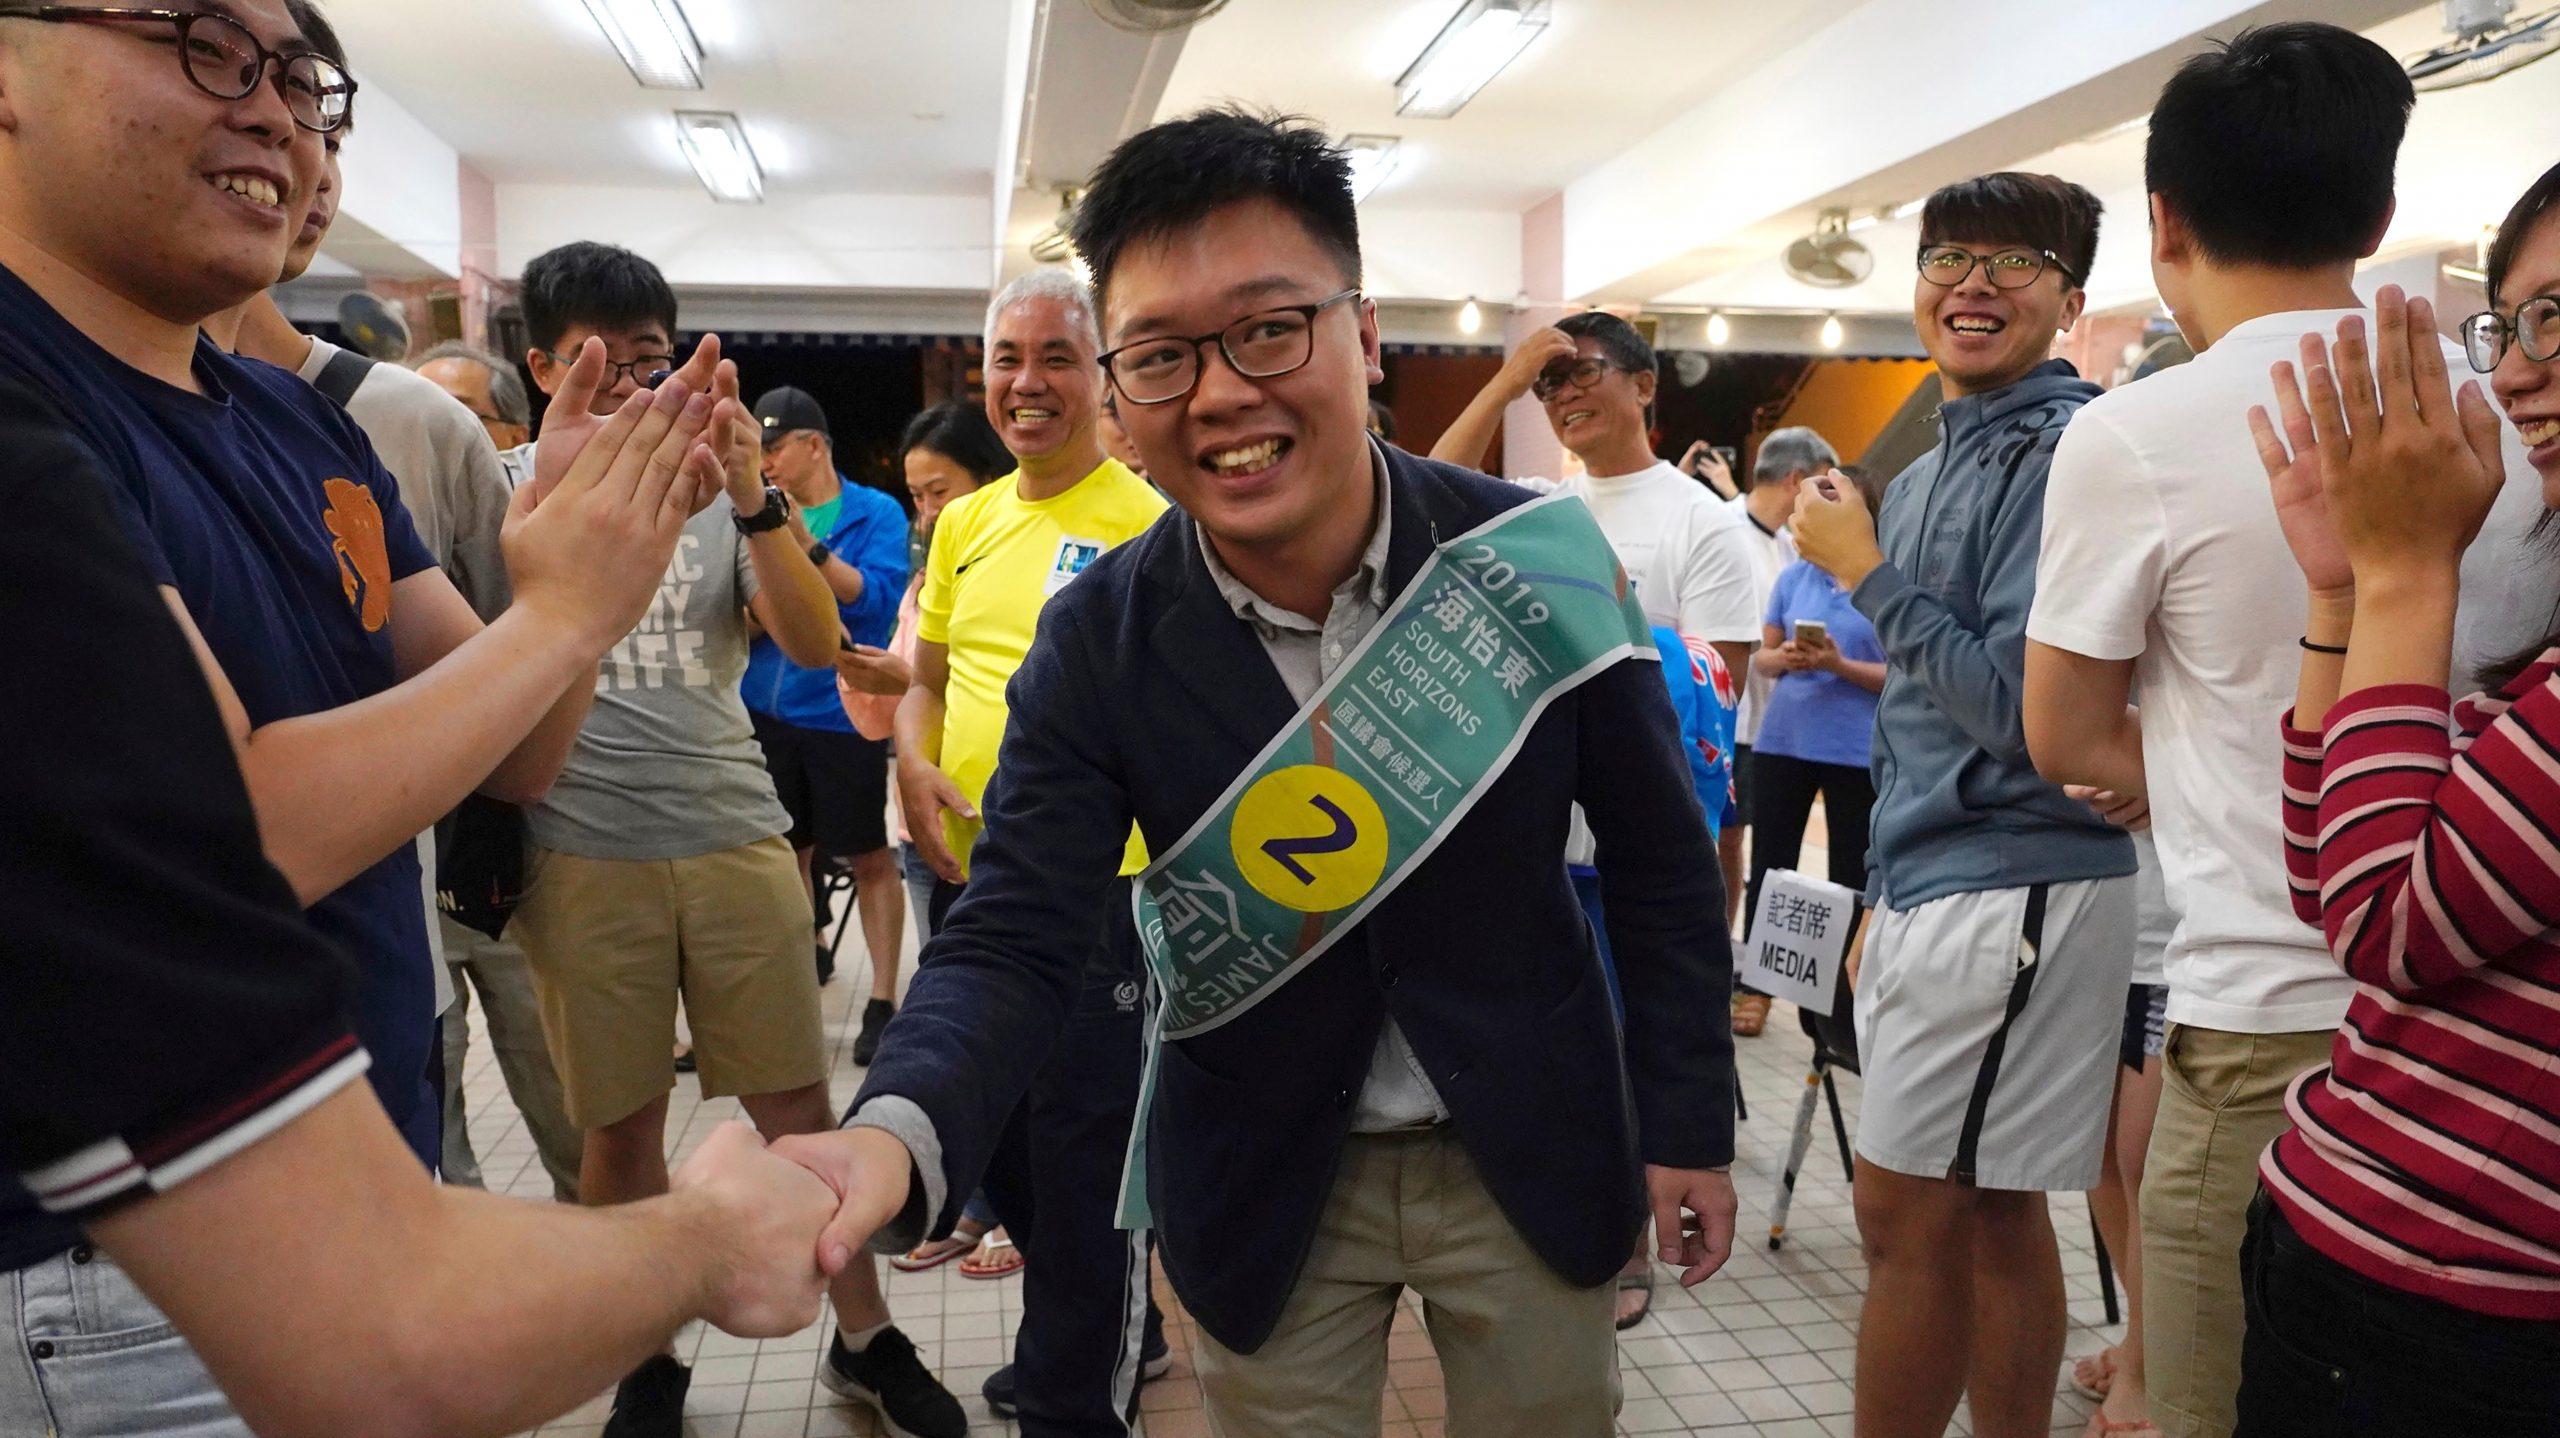 , Hong Kong's Pro-Democracy Movement Just Won a Landslide Victory, Saubio Making Wealth